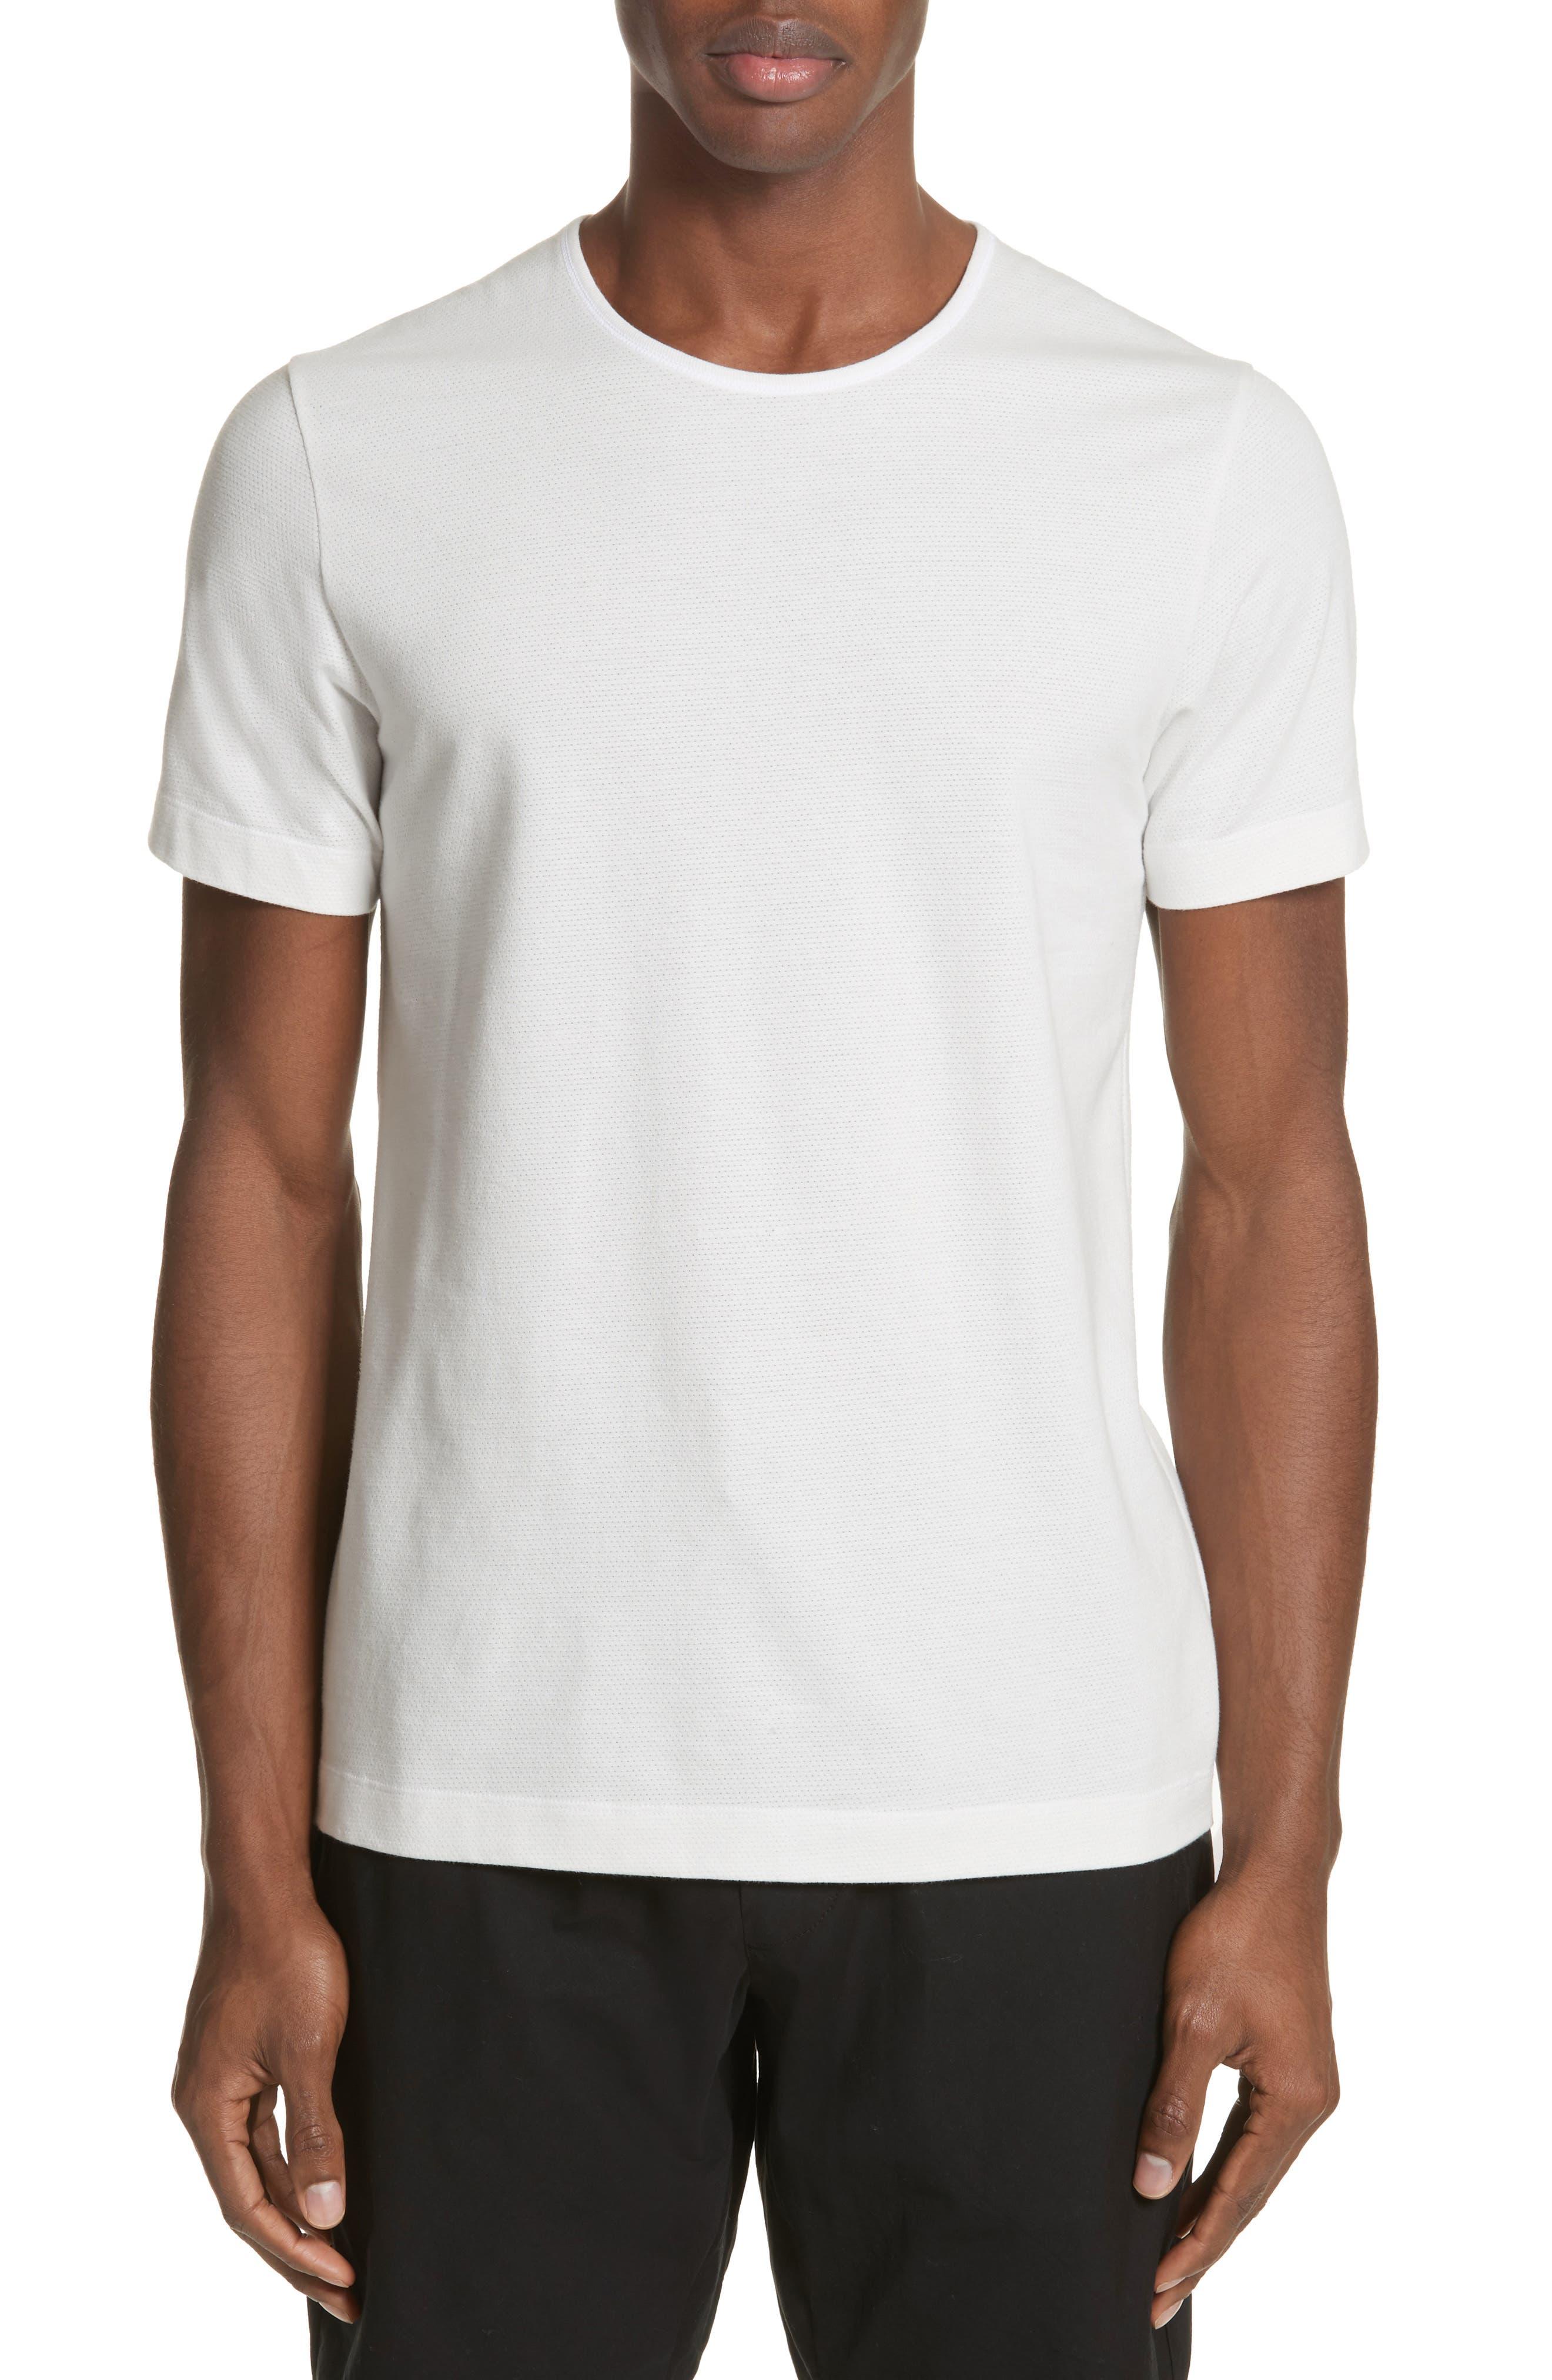 Main Image - wings + horns Mesh Jersey T-Shirt